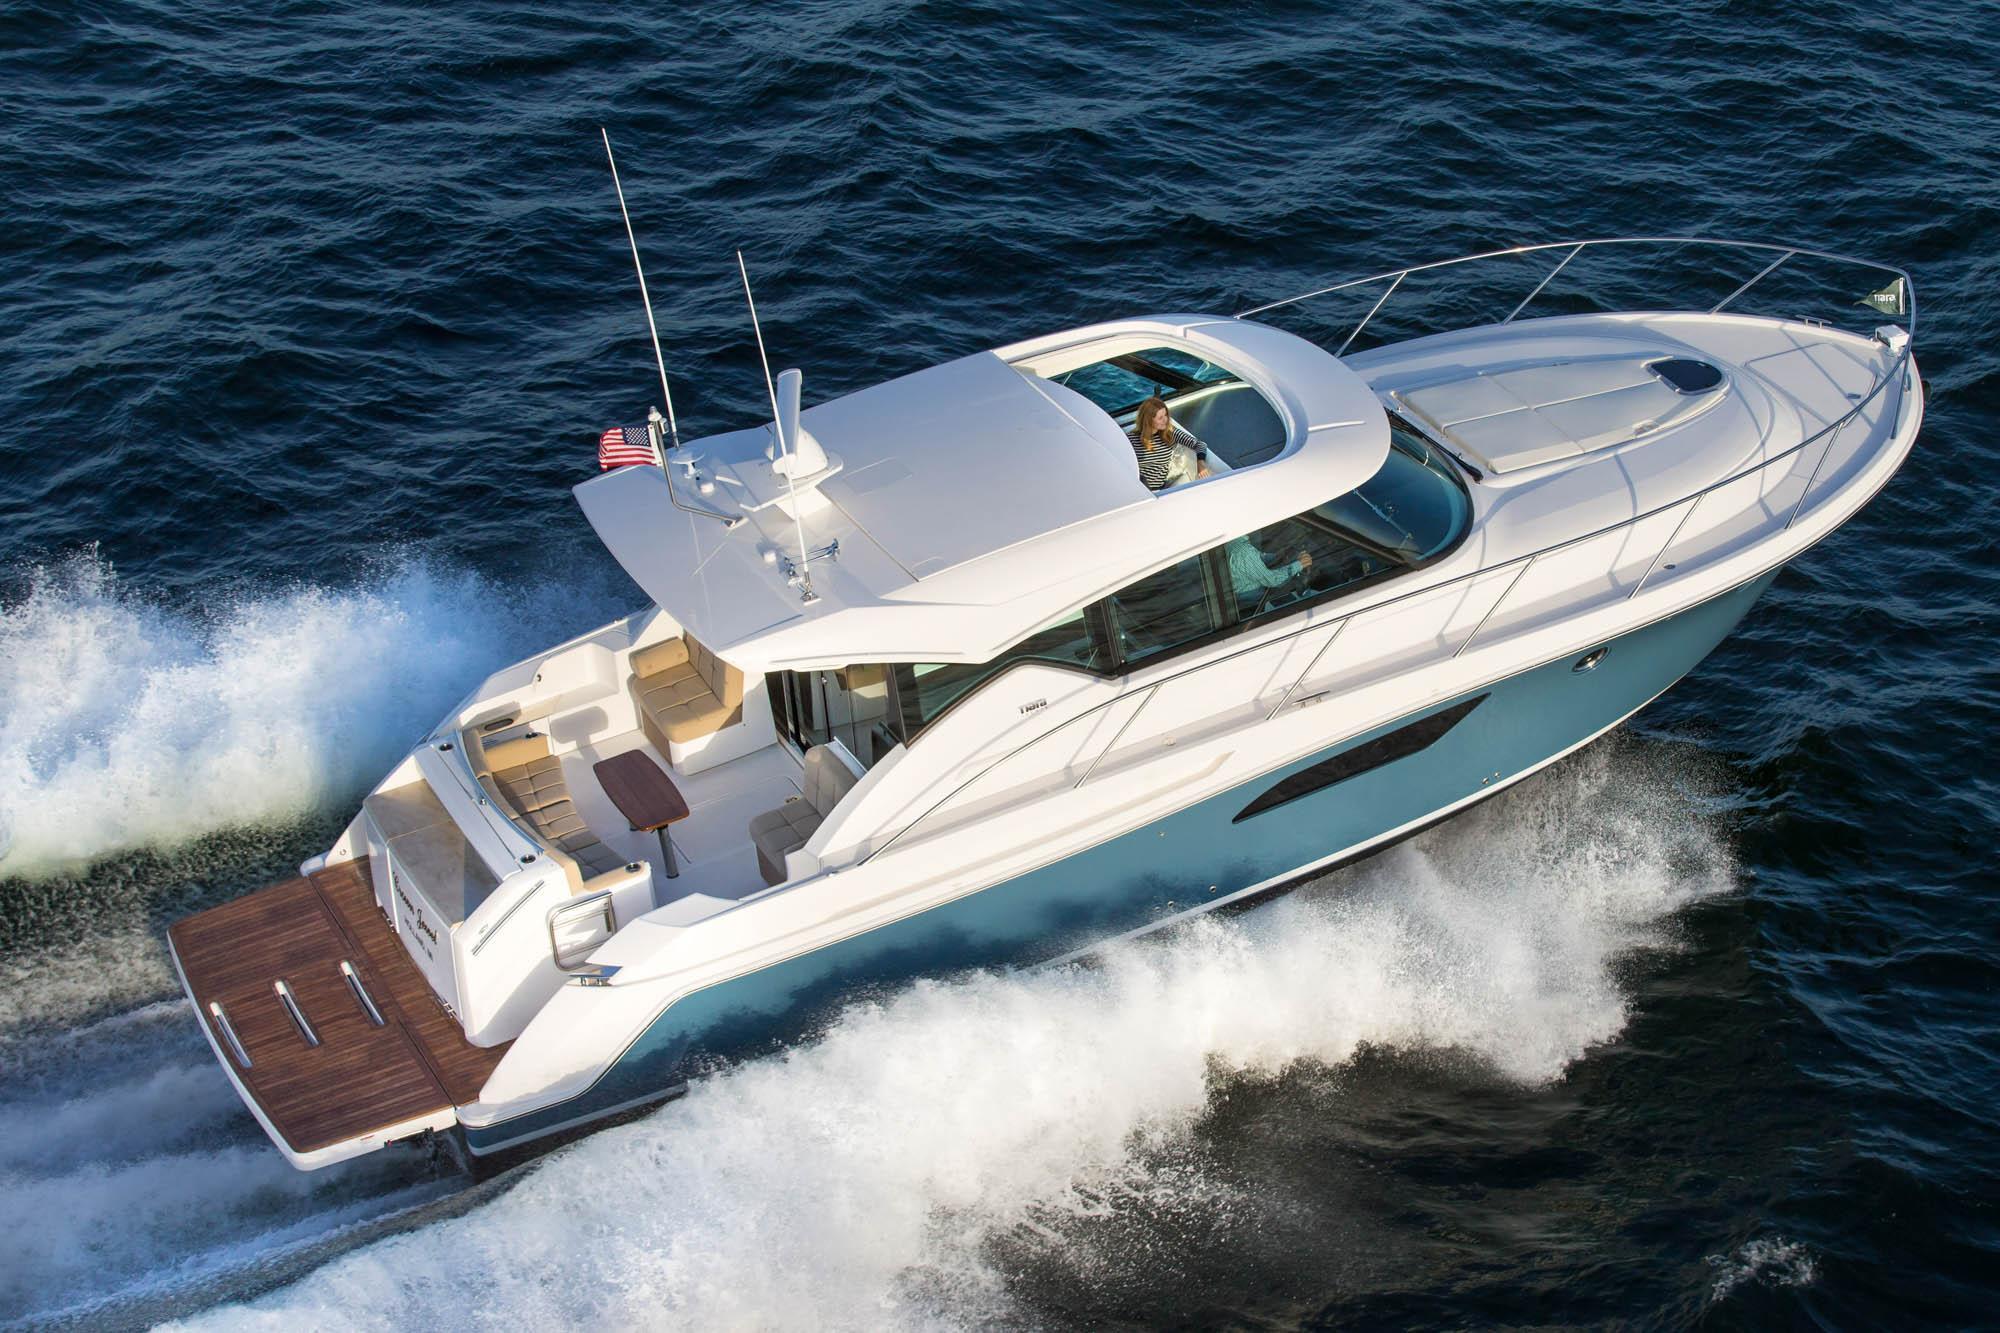 Atlantic City In-Water Boat Show